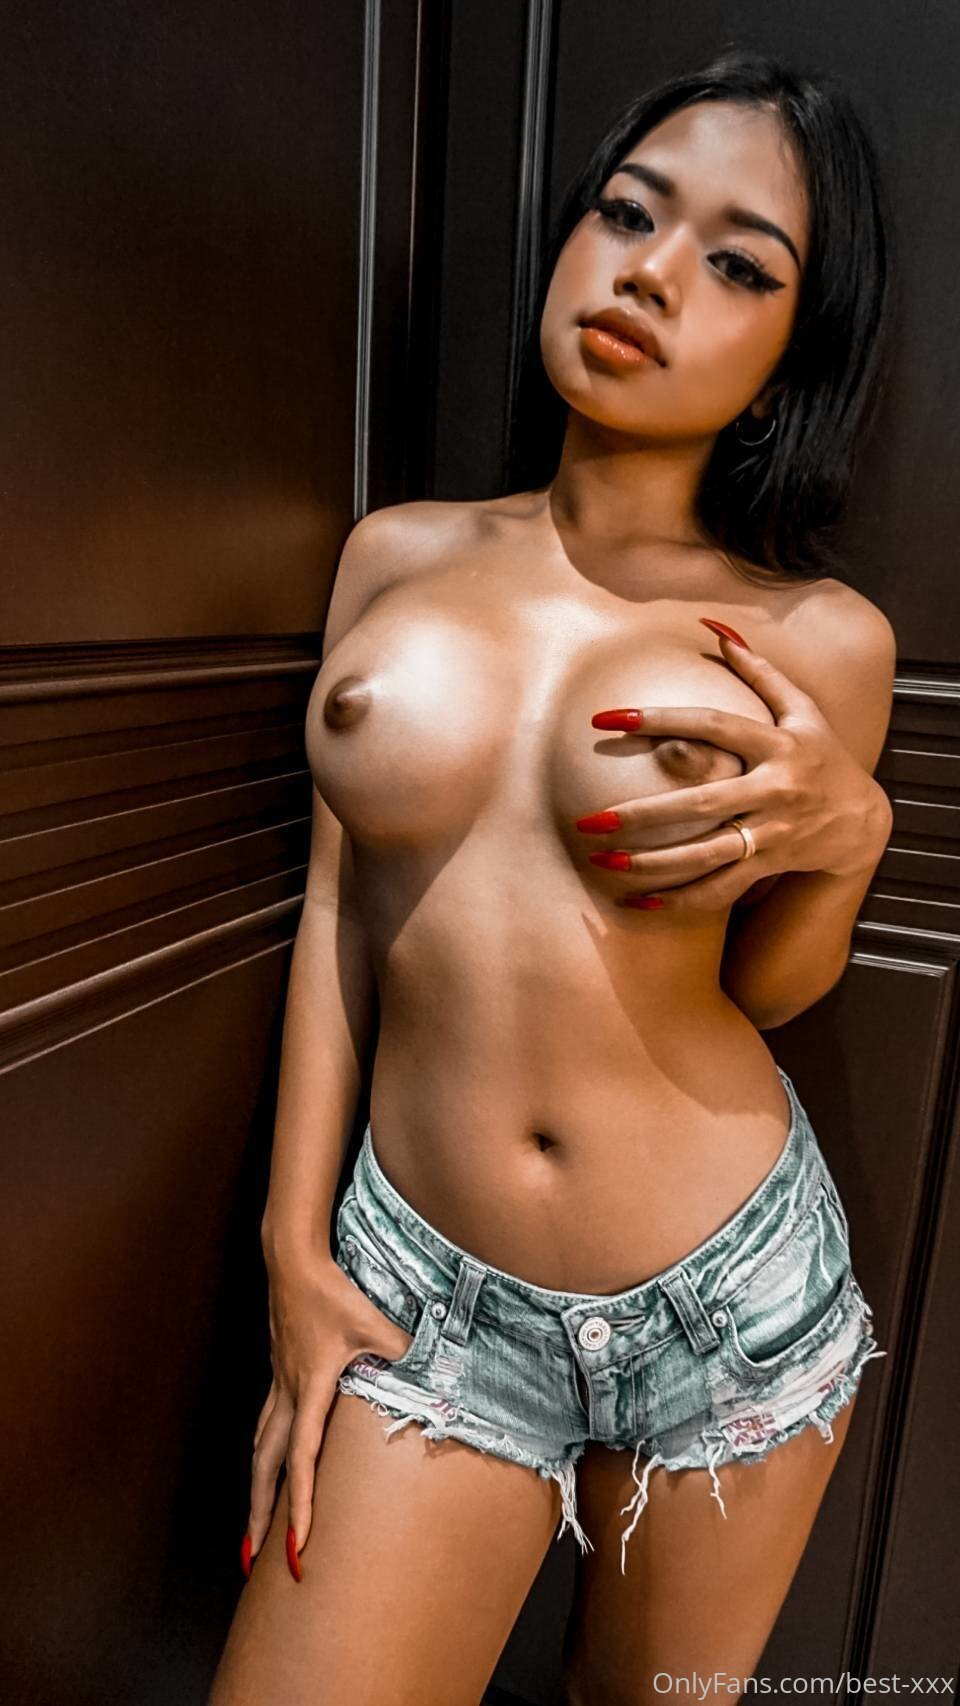 Mo Thai Pattaya Girl Leaked Onlyfans Best Xxx 0088